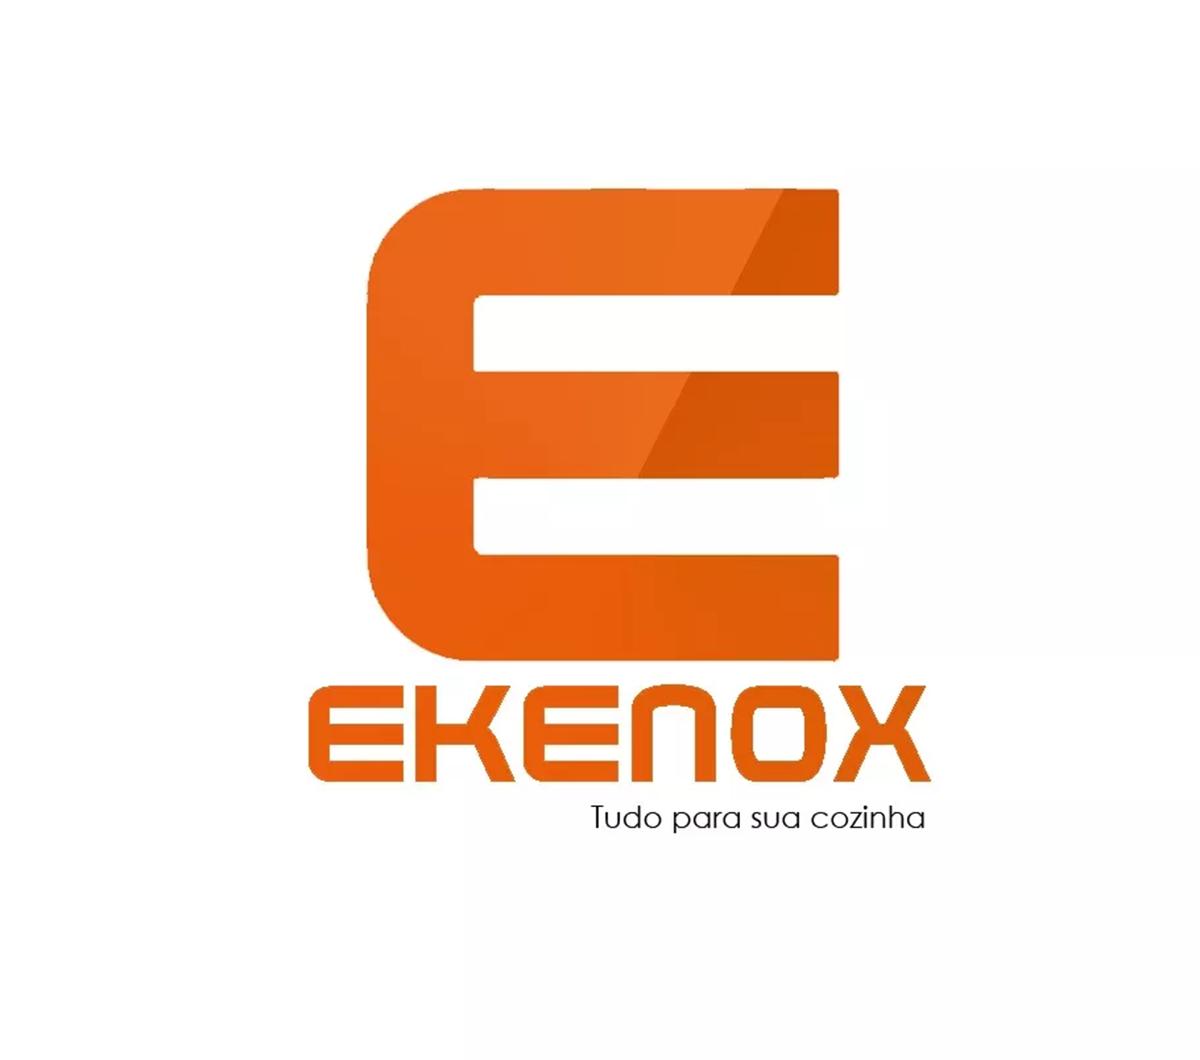 Kit 2 Modelador de Esfirra + 2 Modelador de Pastel  - EKENOX- Equipamentos Industriais